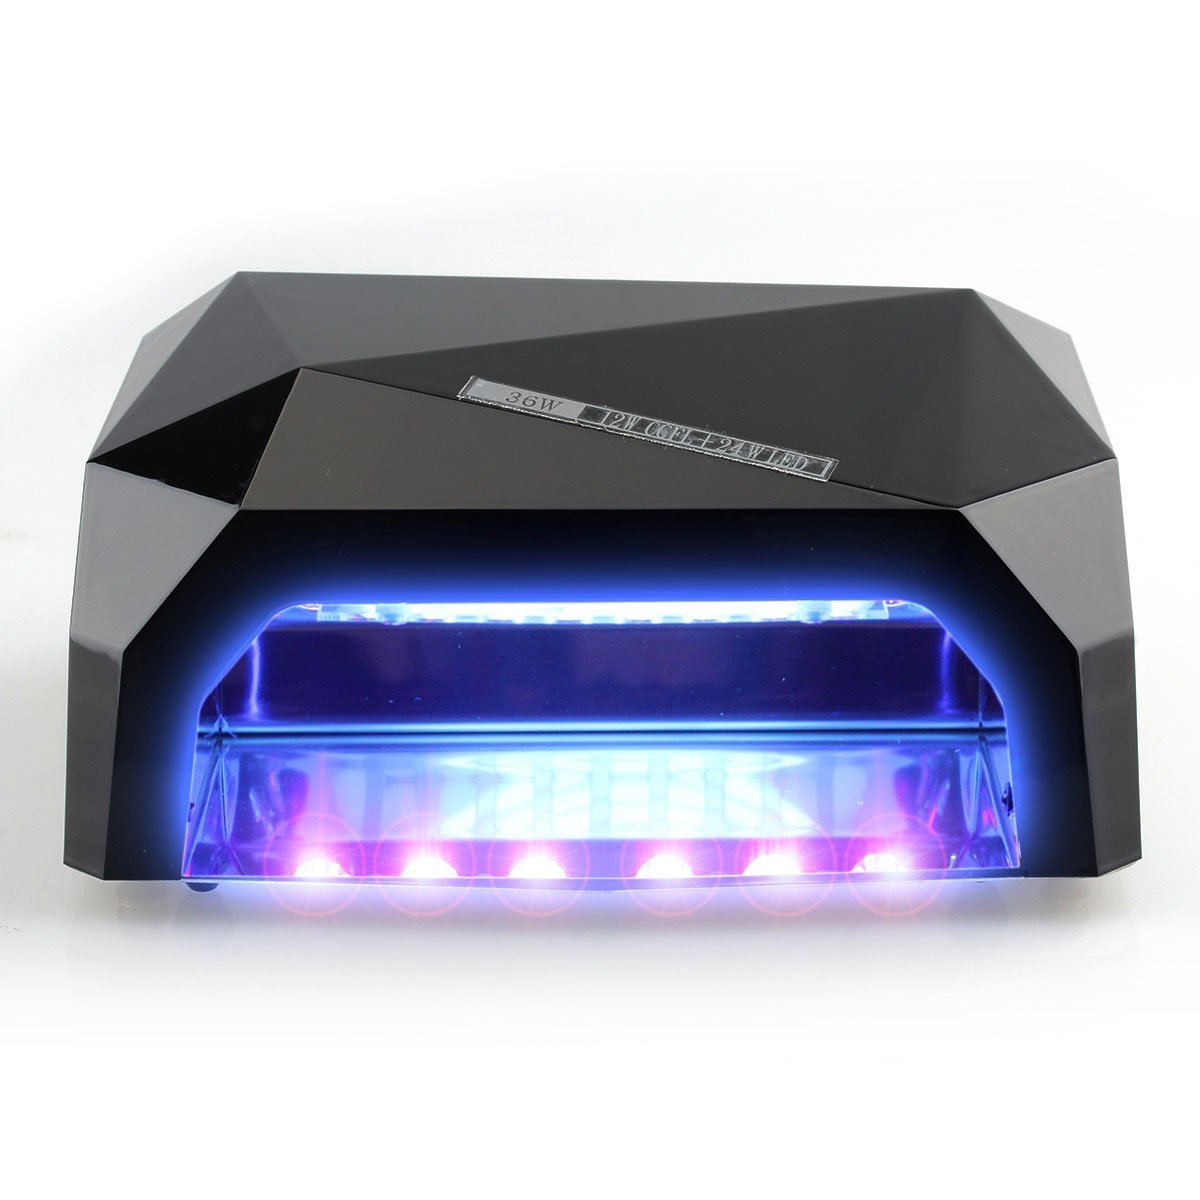 Light Gel Dry Led For Lamp Uv Quick Gellen Pro Manicurepedicure 36w Dryer Black PolishNo Nail Harm Machine IYy7bf6gv